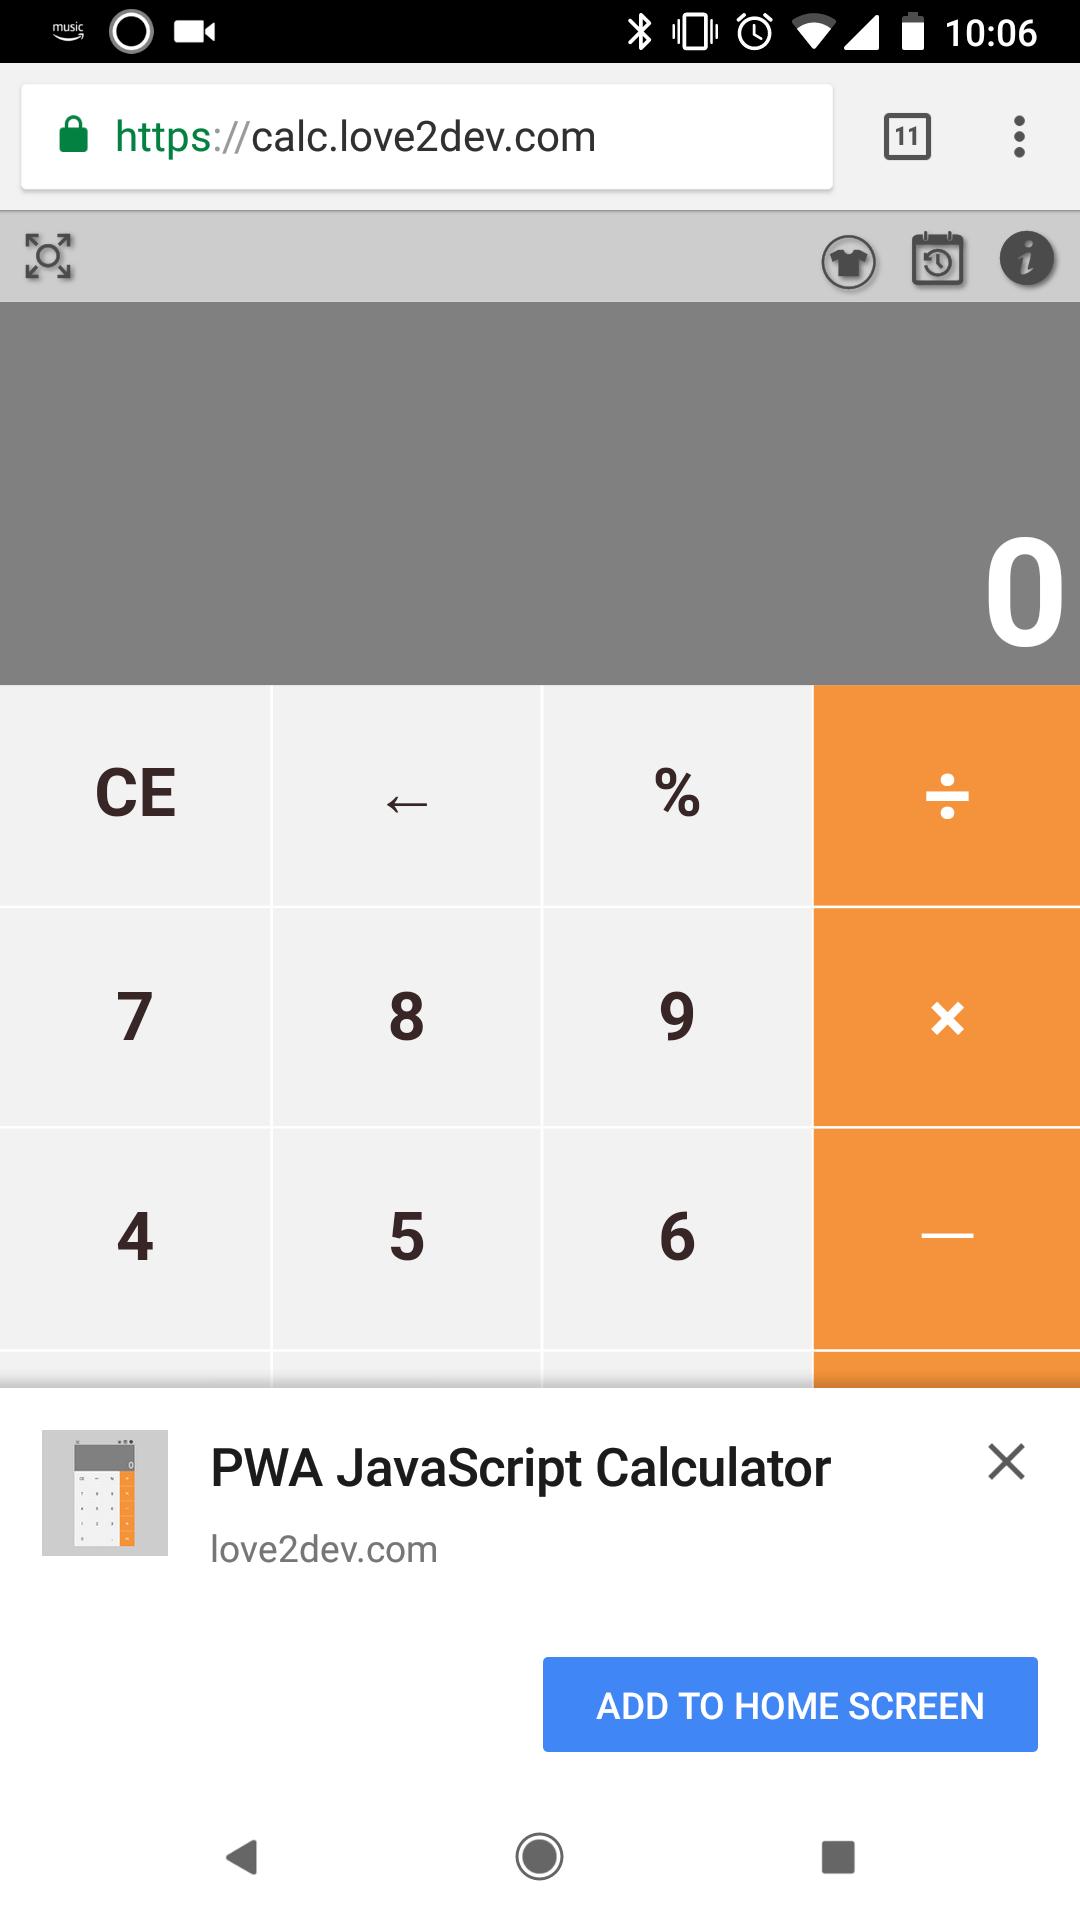 Introducing The Javascript Calculator Progressive Web App (Pwa)